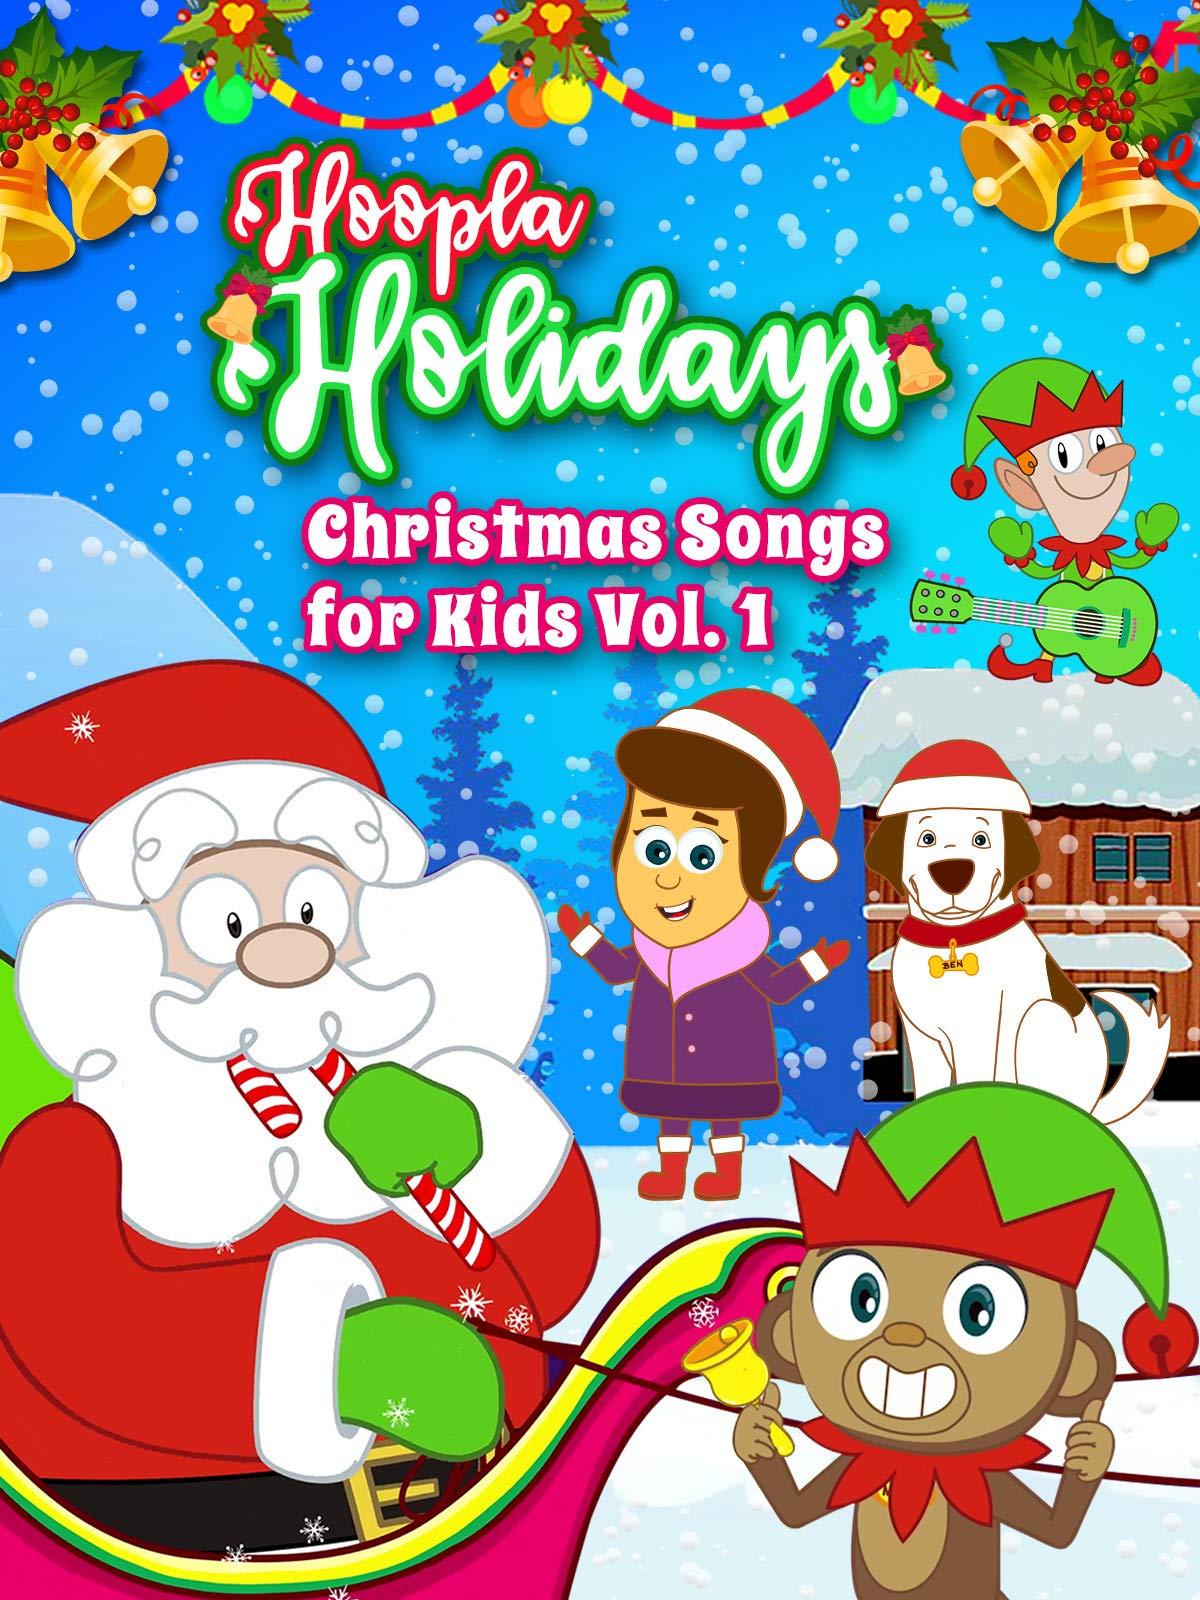 Hoopla Holidays - Christmas Songs for Kids Vol 1